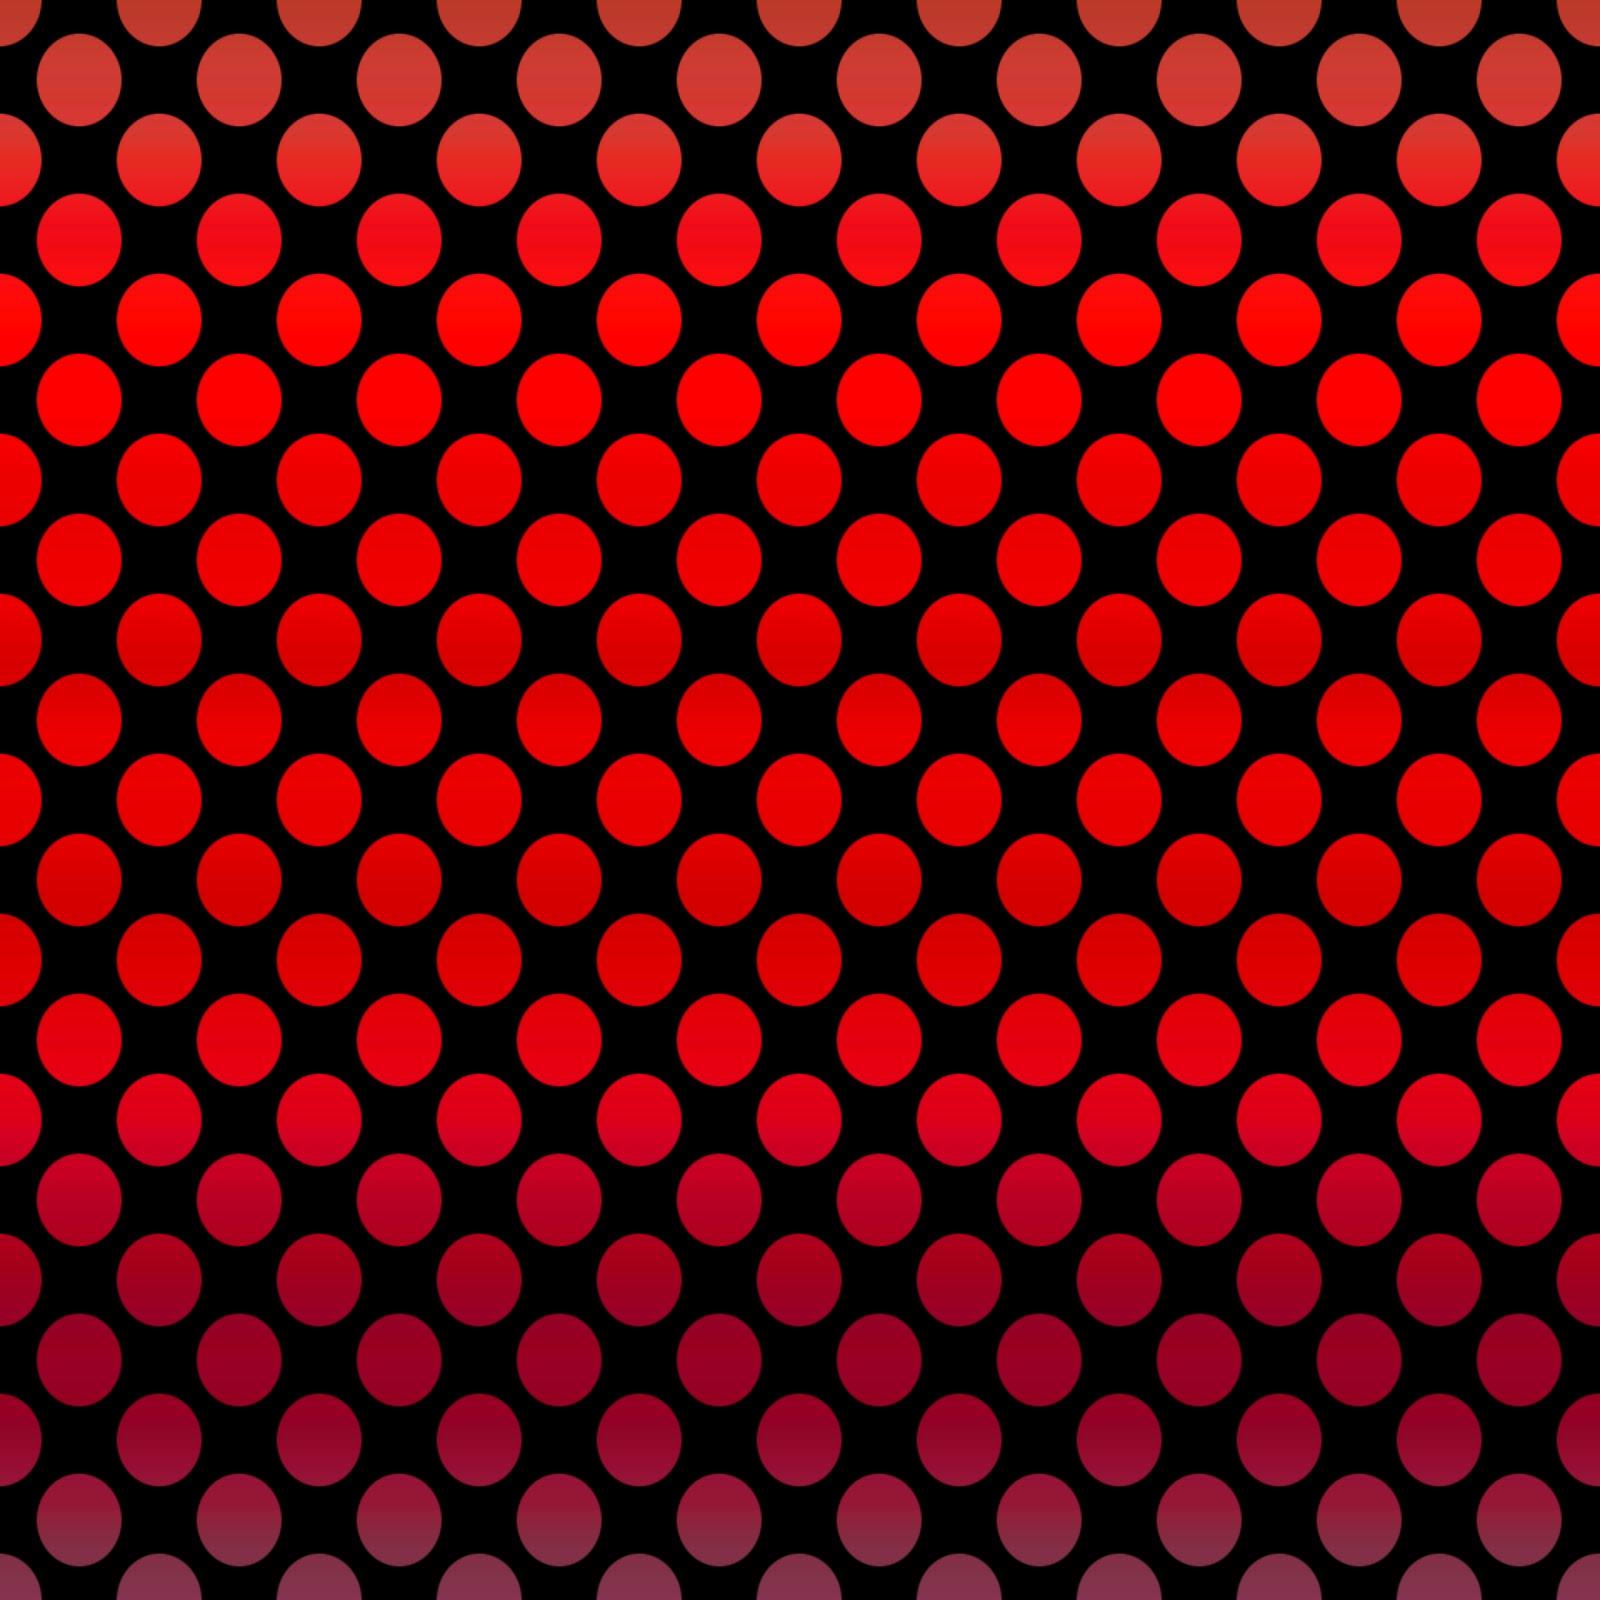 bonjourvintage: Free Digital Scrapbook Papers - Red and ...